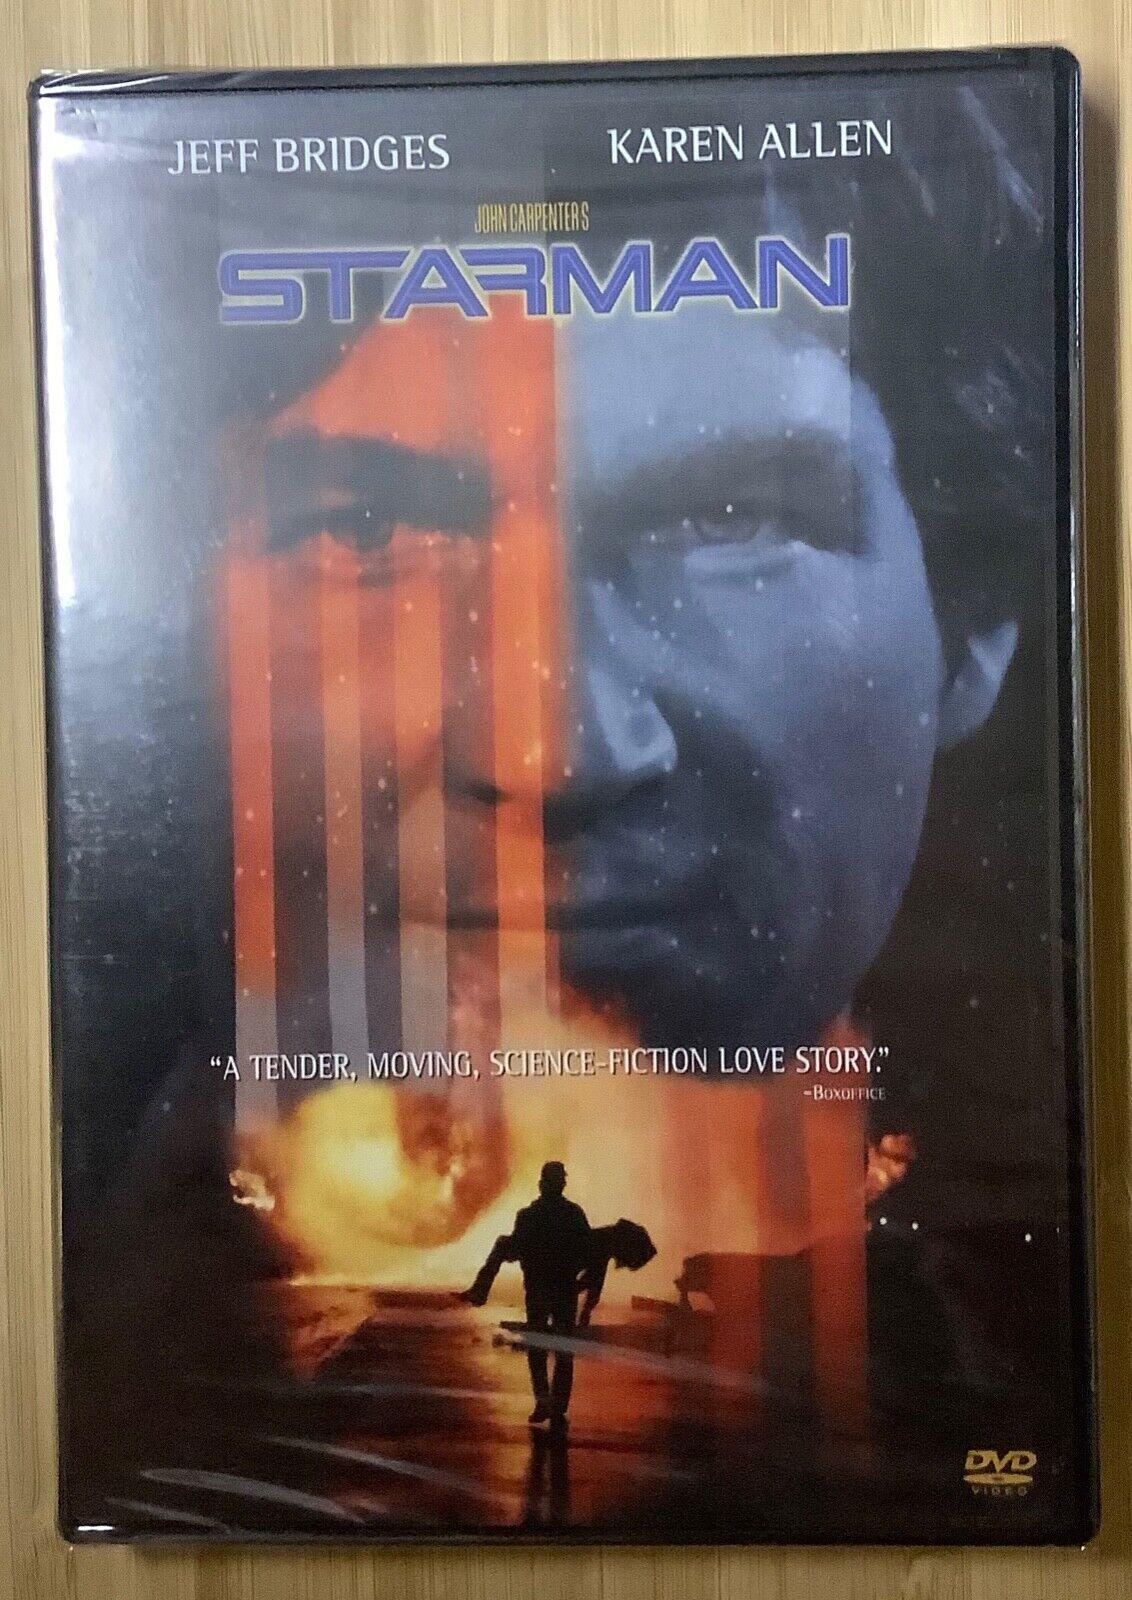 Starman 1984 FS DVD Jeff Bridges Karen Allen John Carpenter Sci-fi NEW SEALED - $5.00